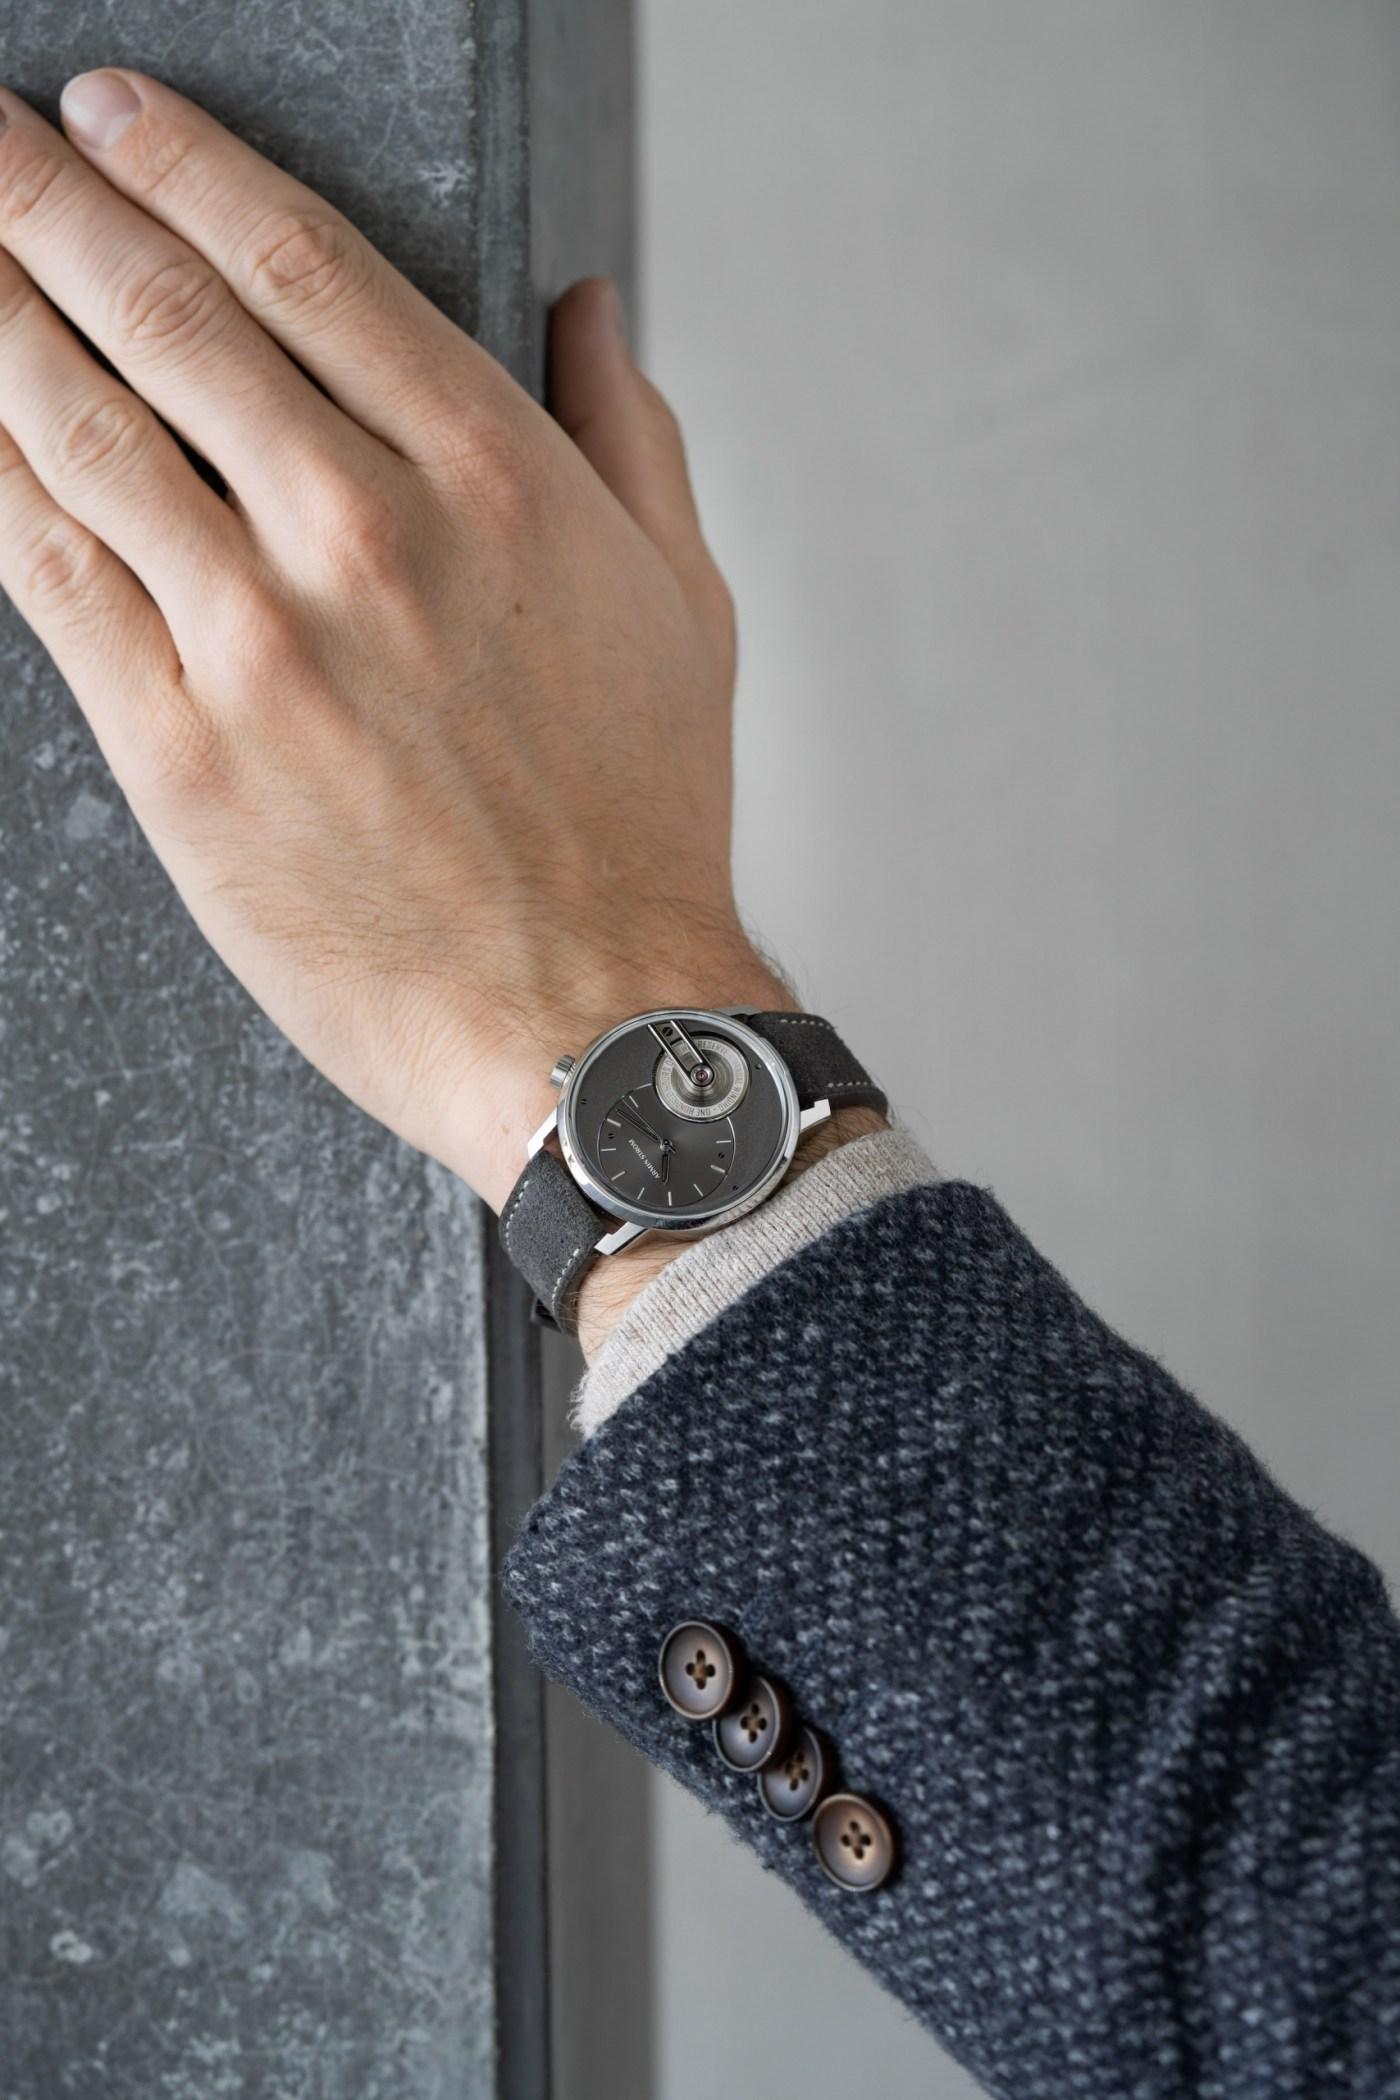 Armin Strom Tribute 1 wristshot